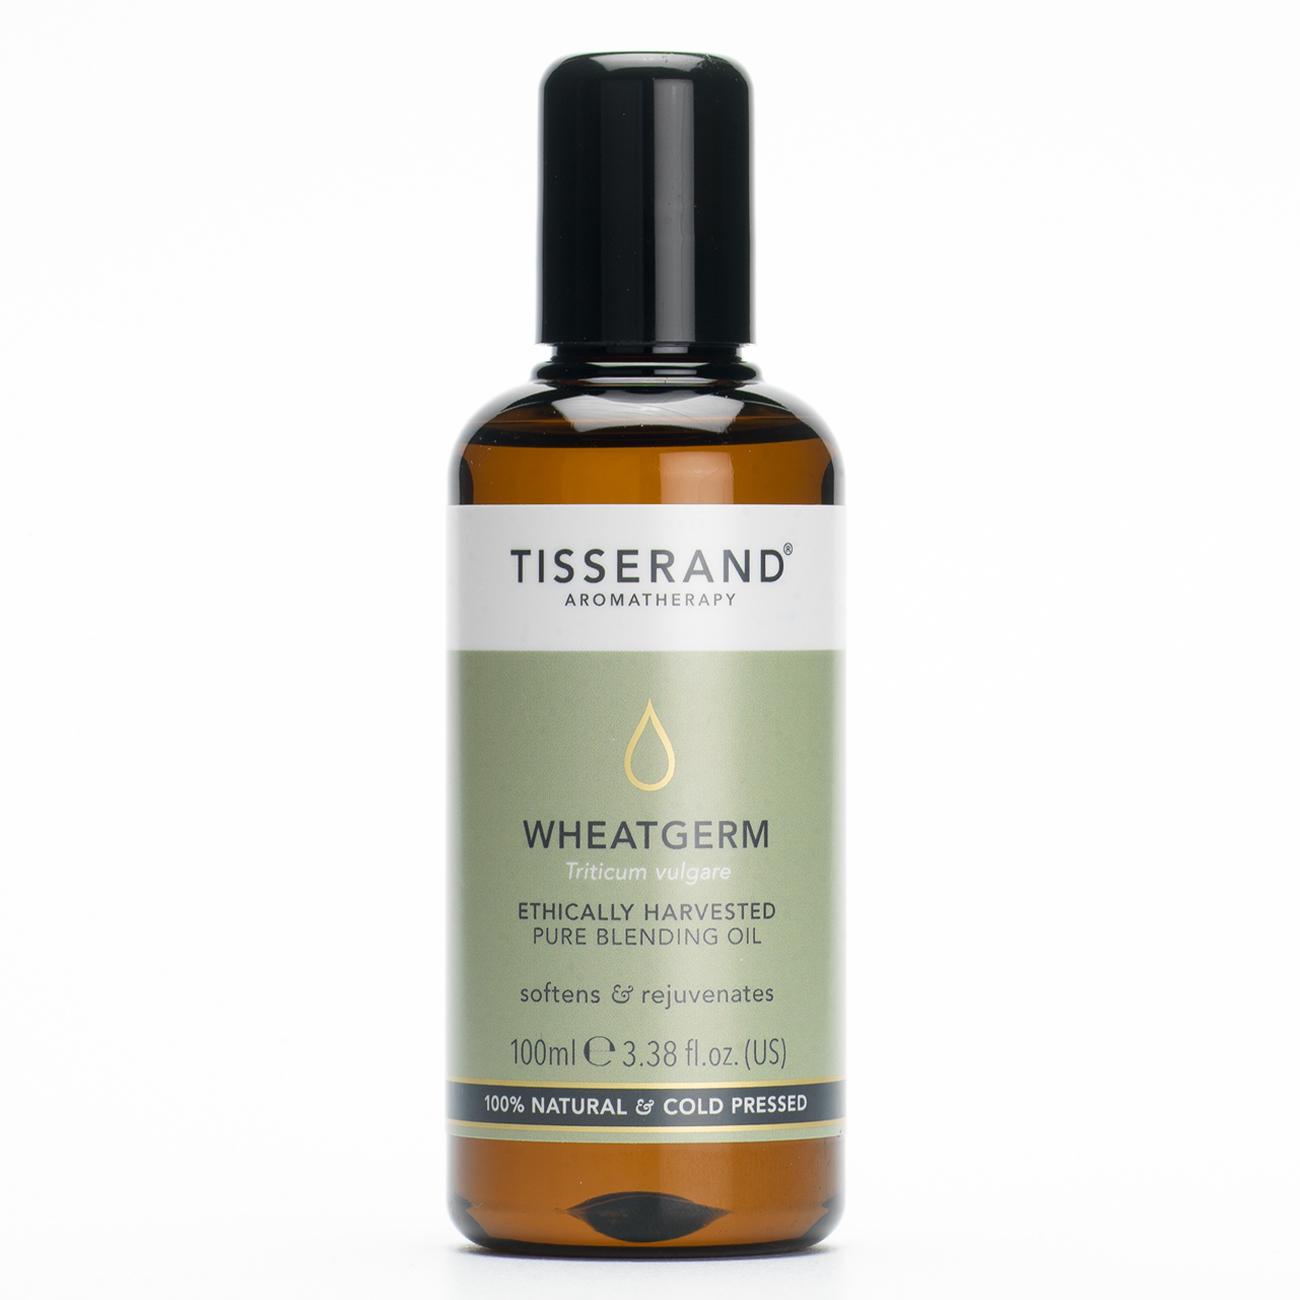 Wheatgerm Ethically Harvested Pure Blending Oil 100ml